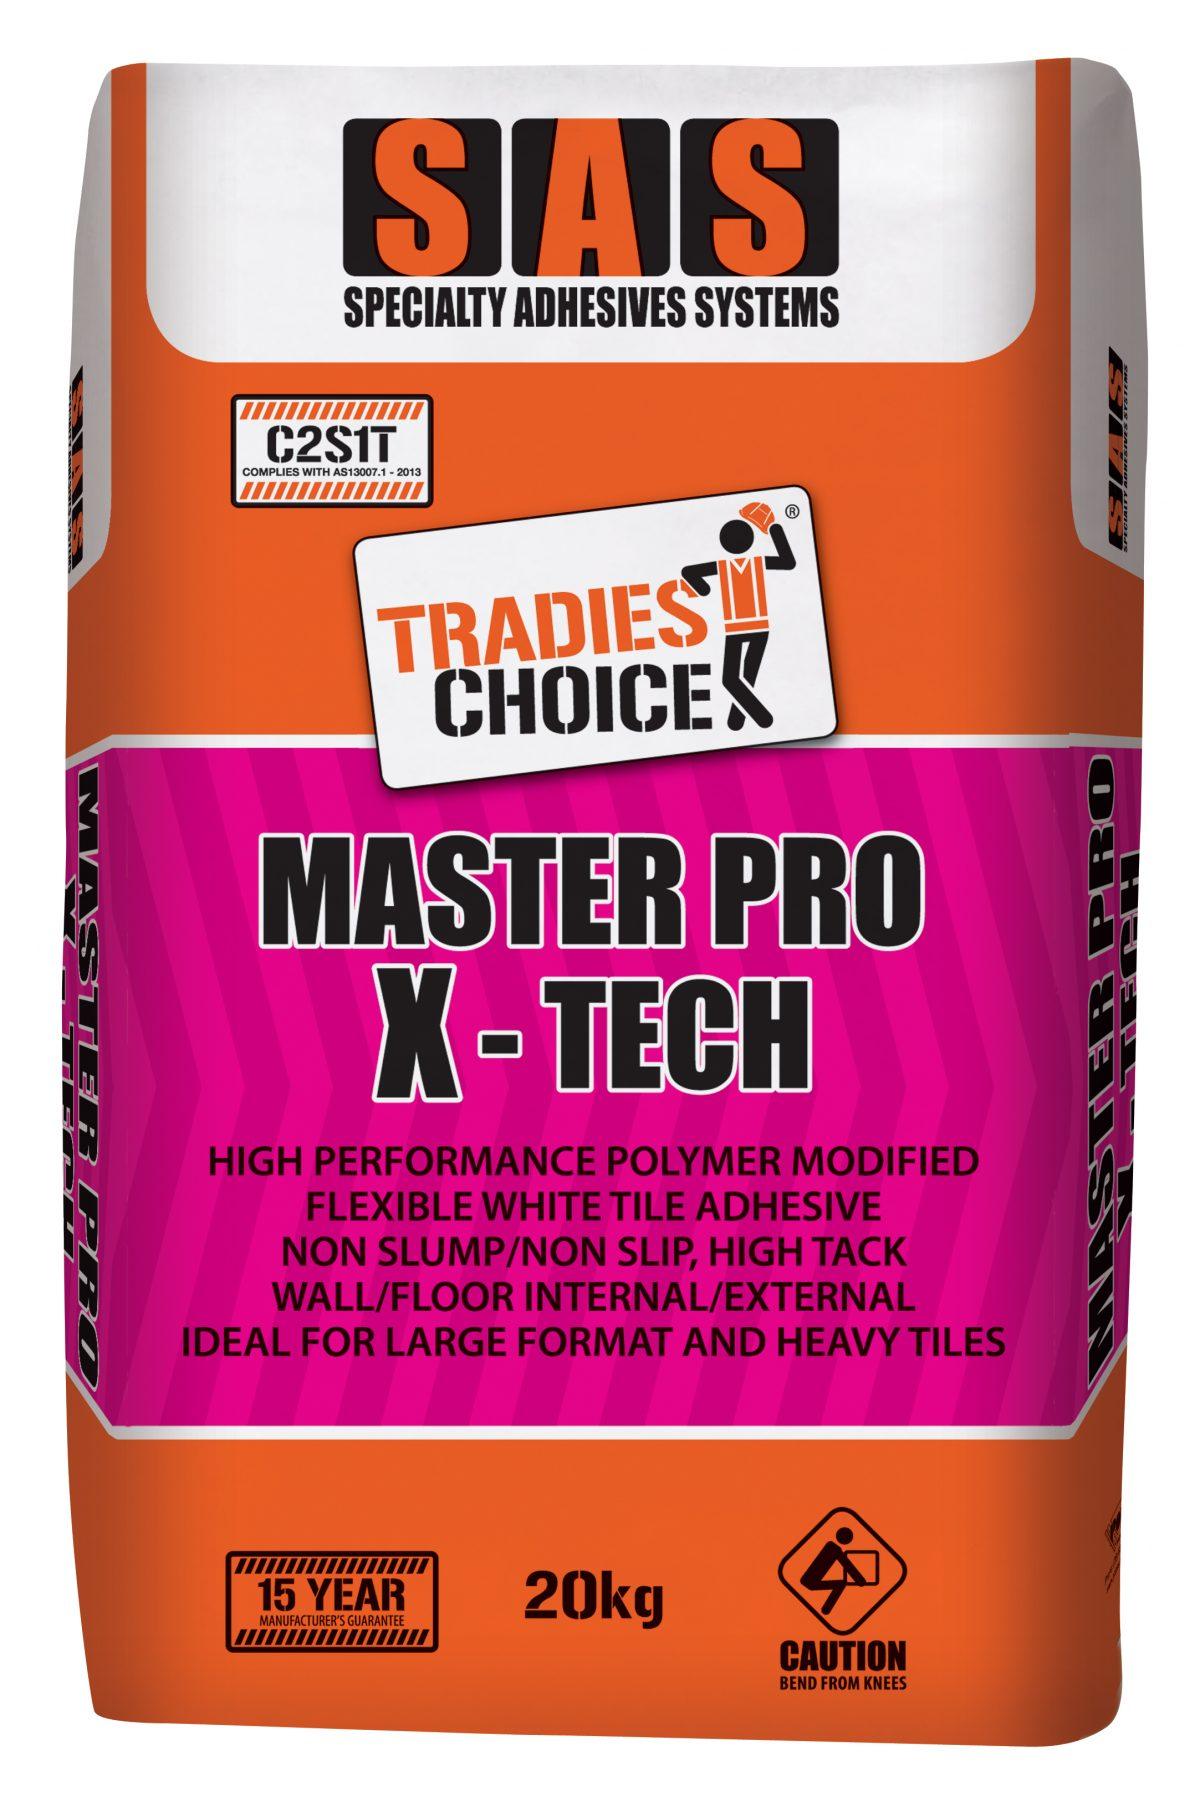 TRADIES CHOICE MASTER PRO X-TEC 20kg ADHESIVE